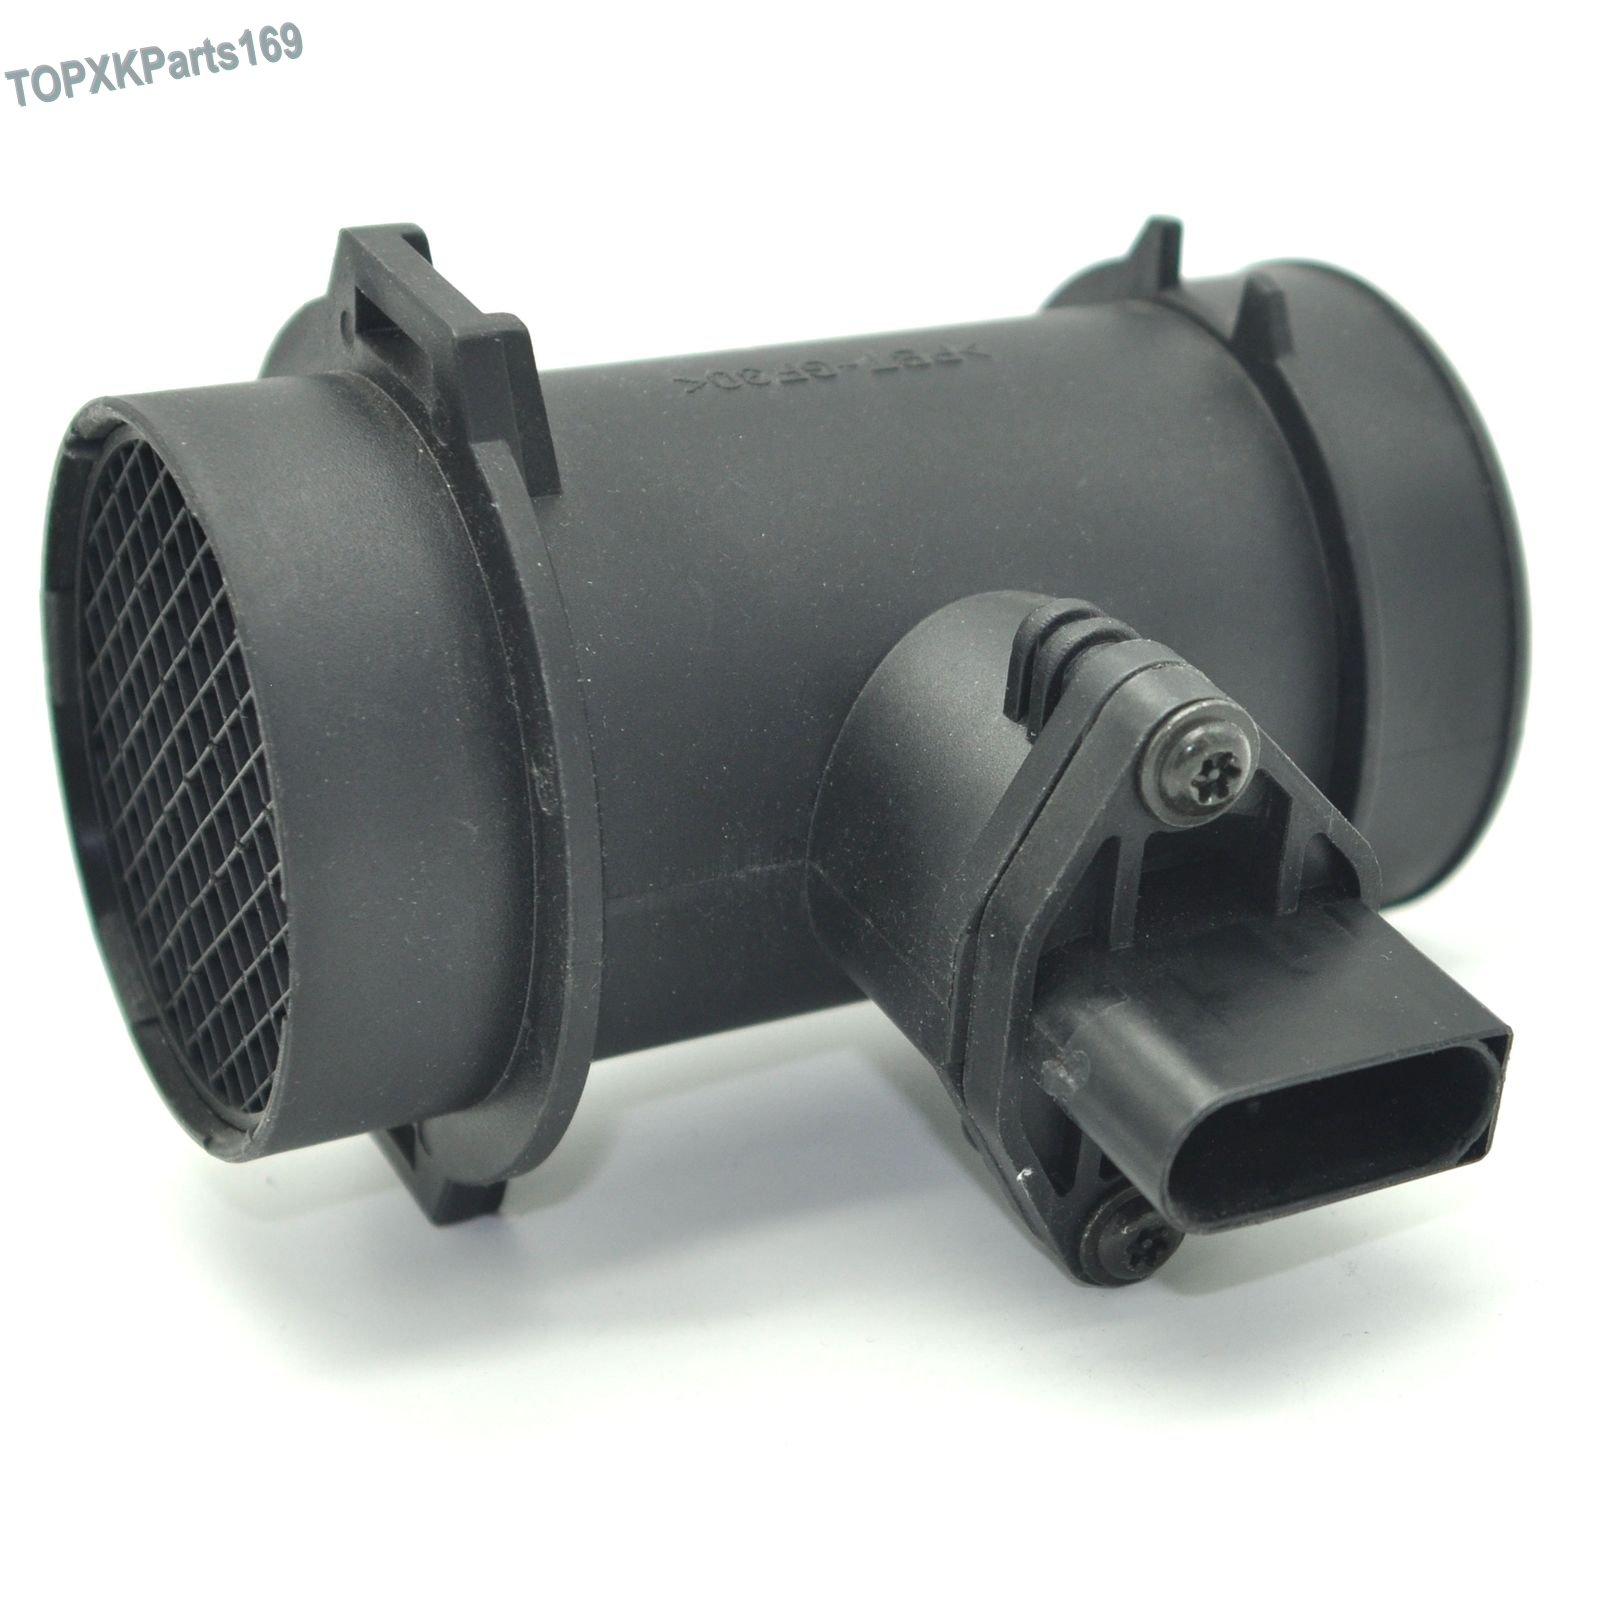 MAF Mass Air Flow Sensor for 97-98 Mercedes-Benz C230 99-01 Mercedes-Benz SLK230